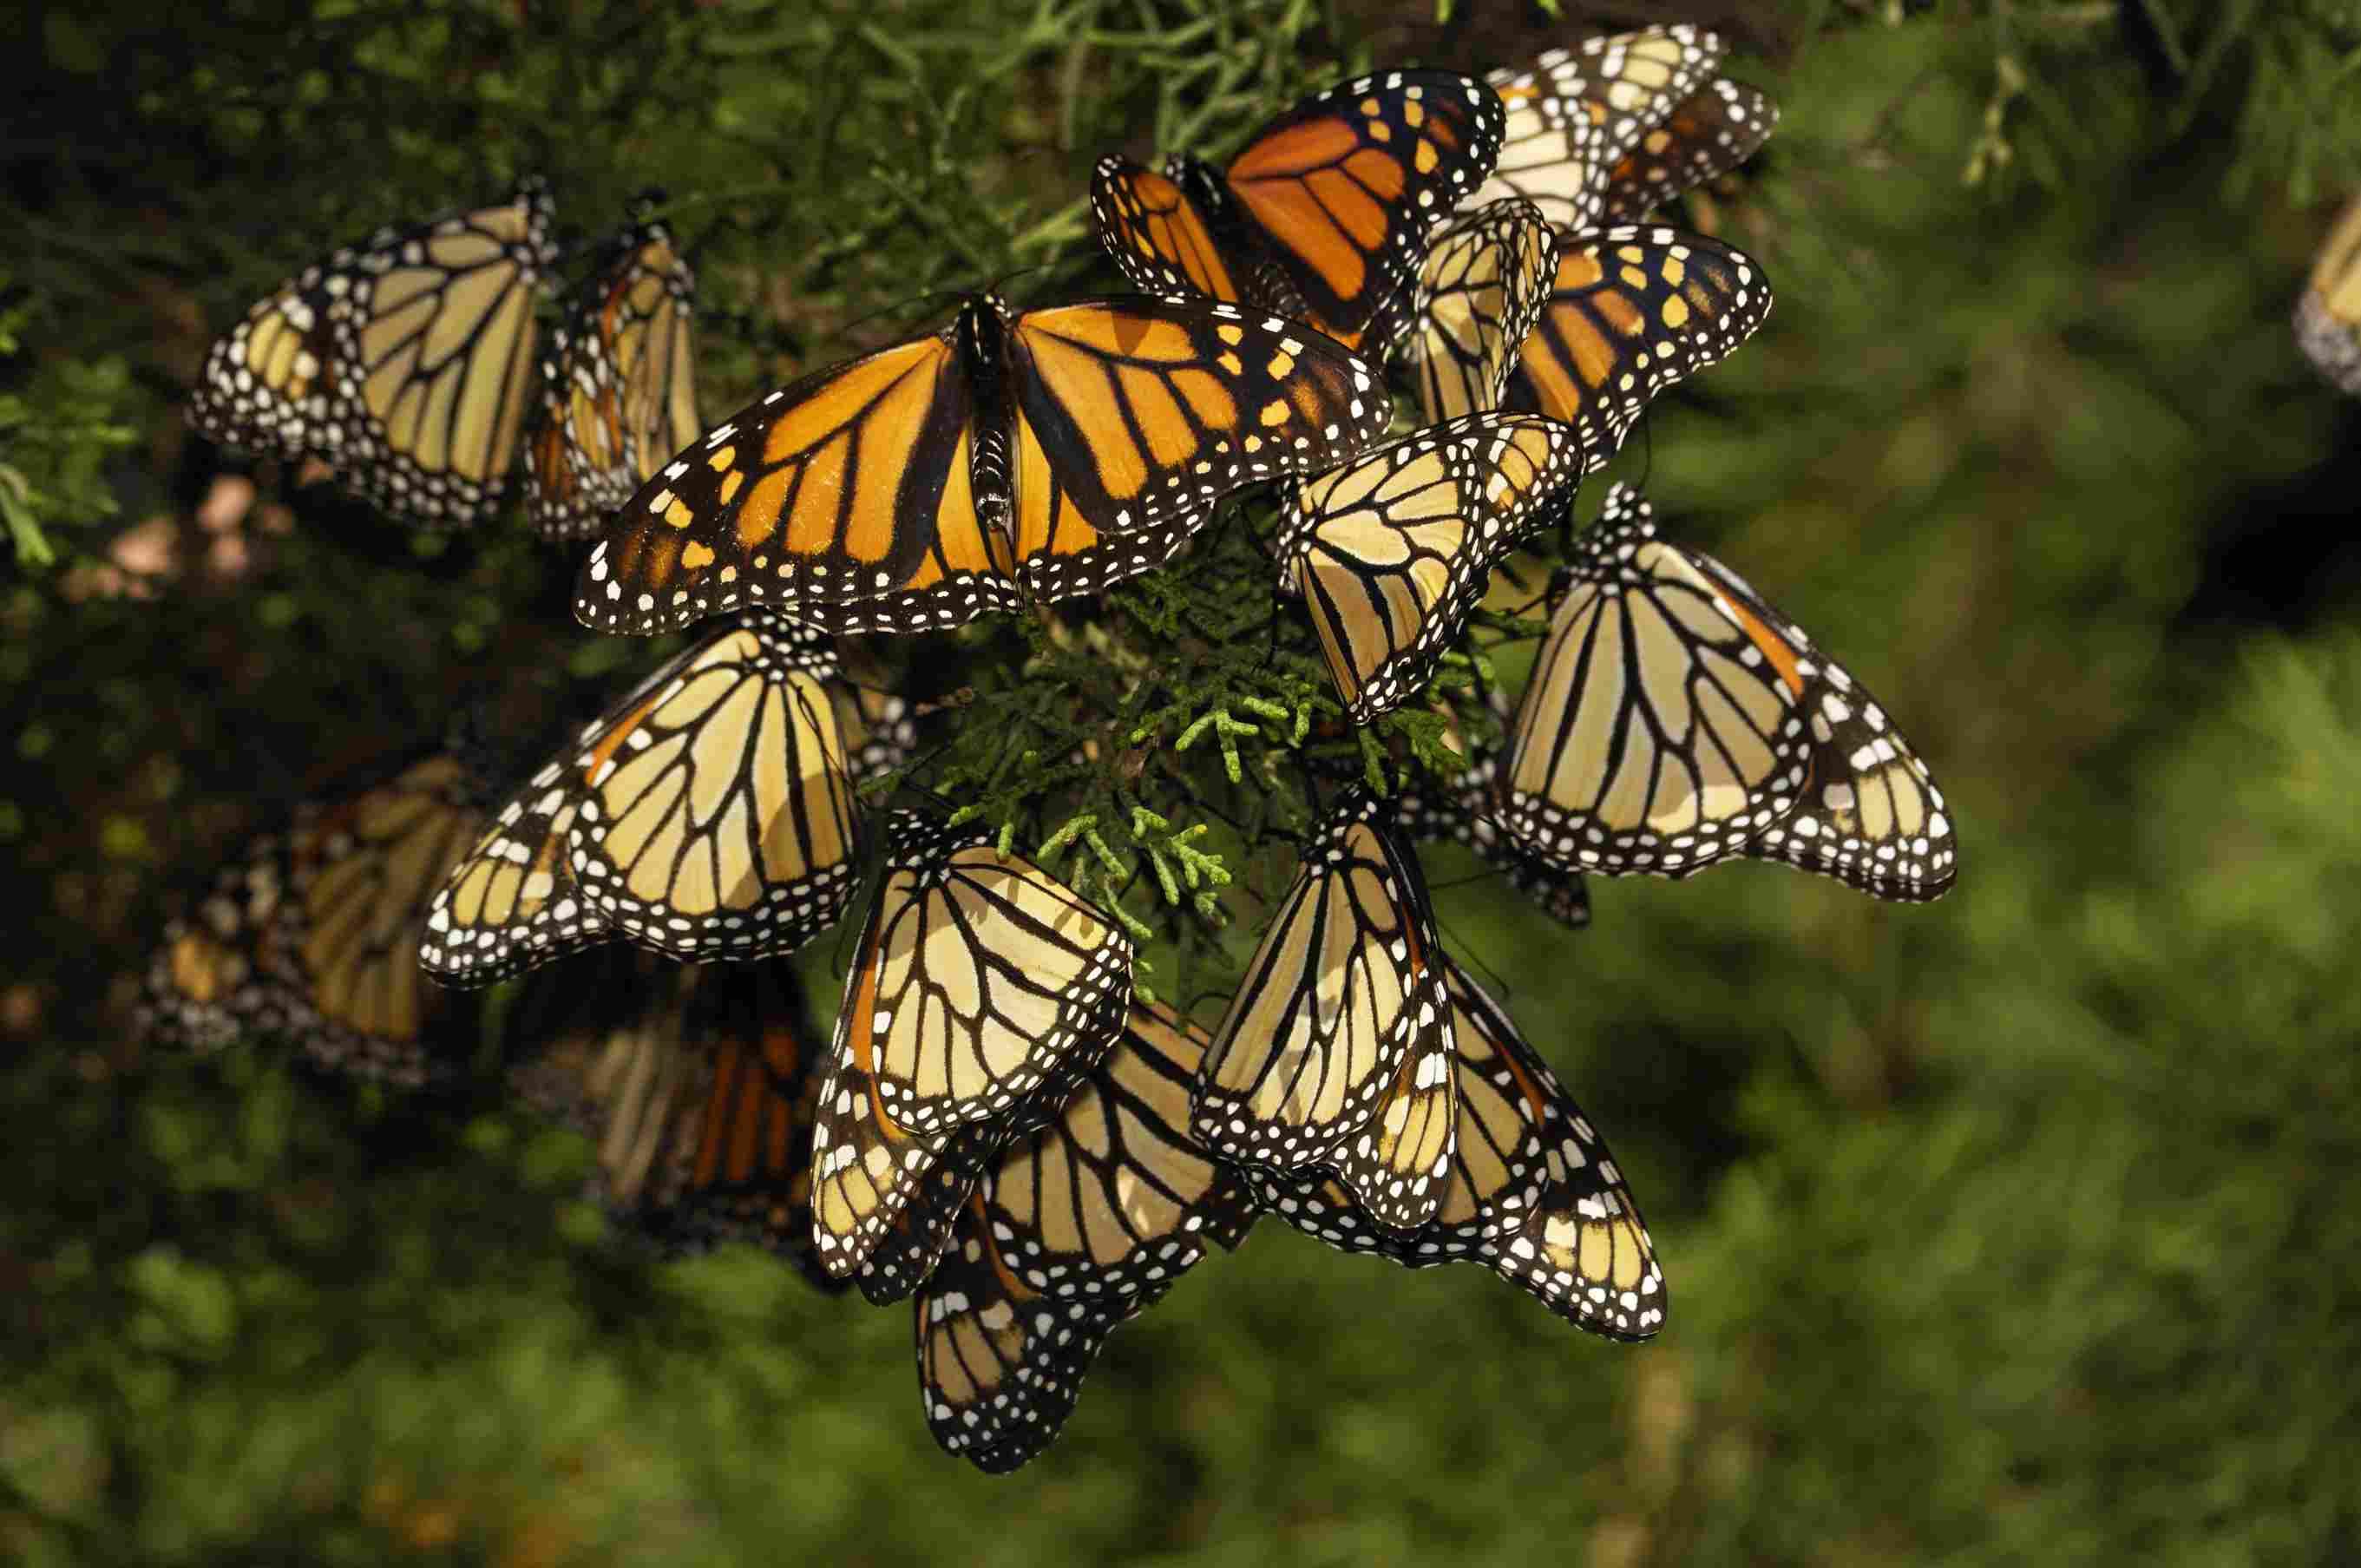 Monarch butterflies resting on a pine branch